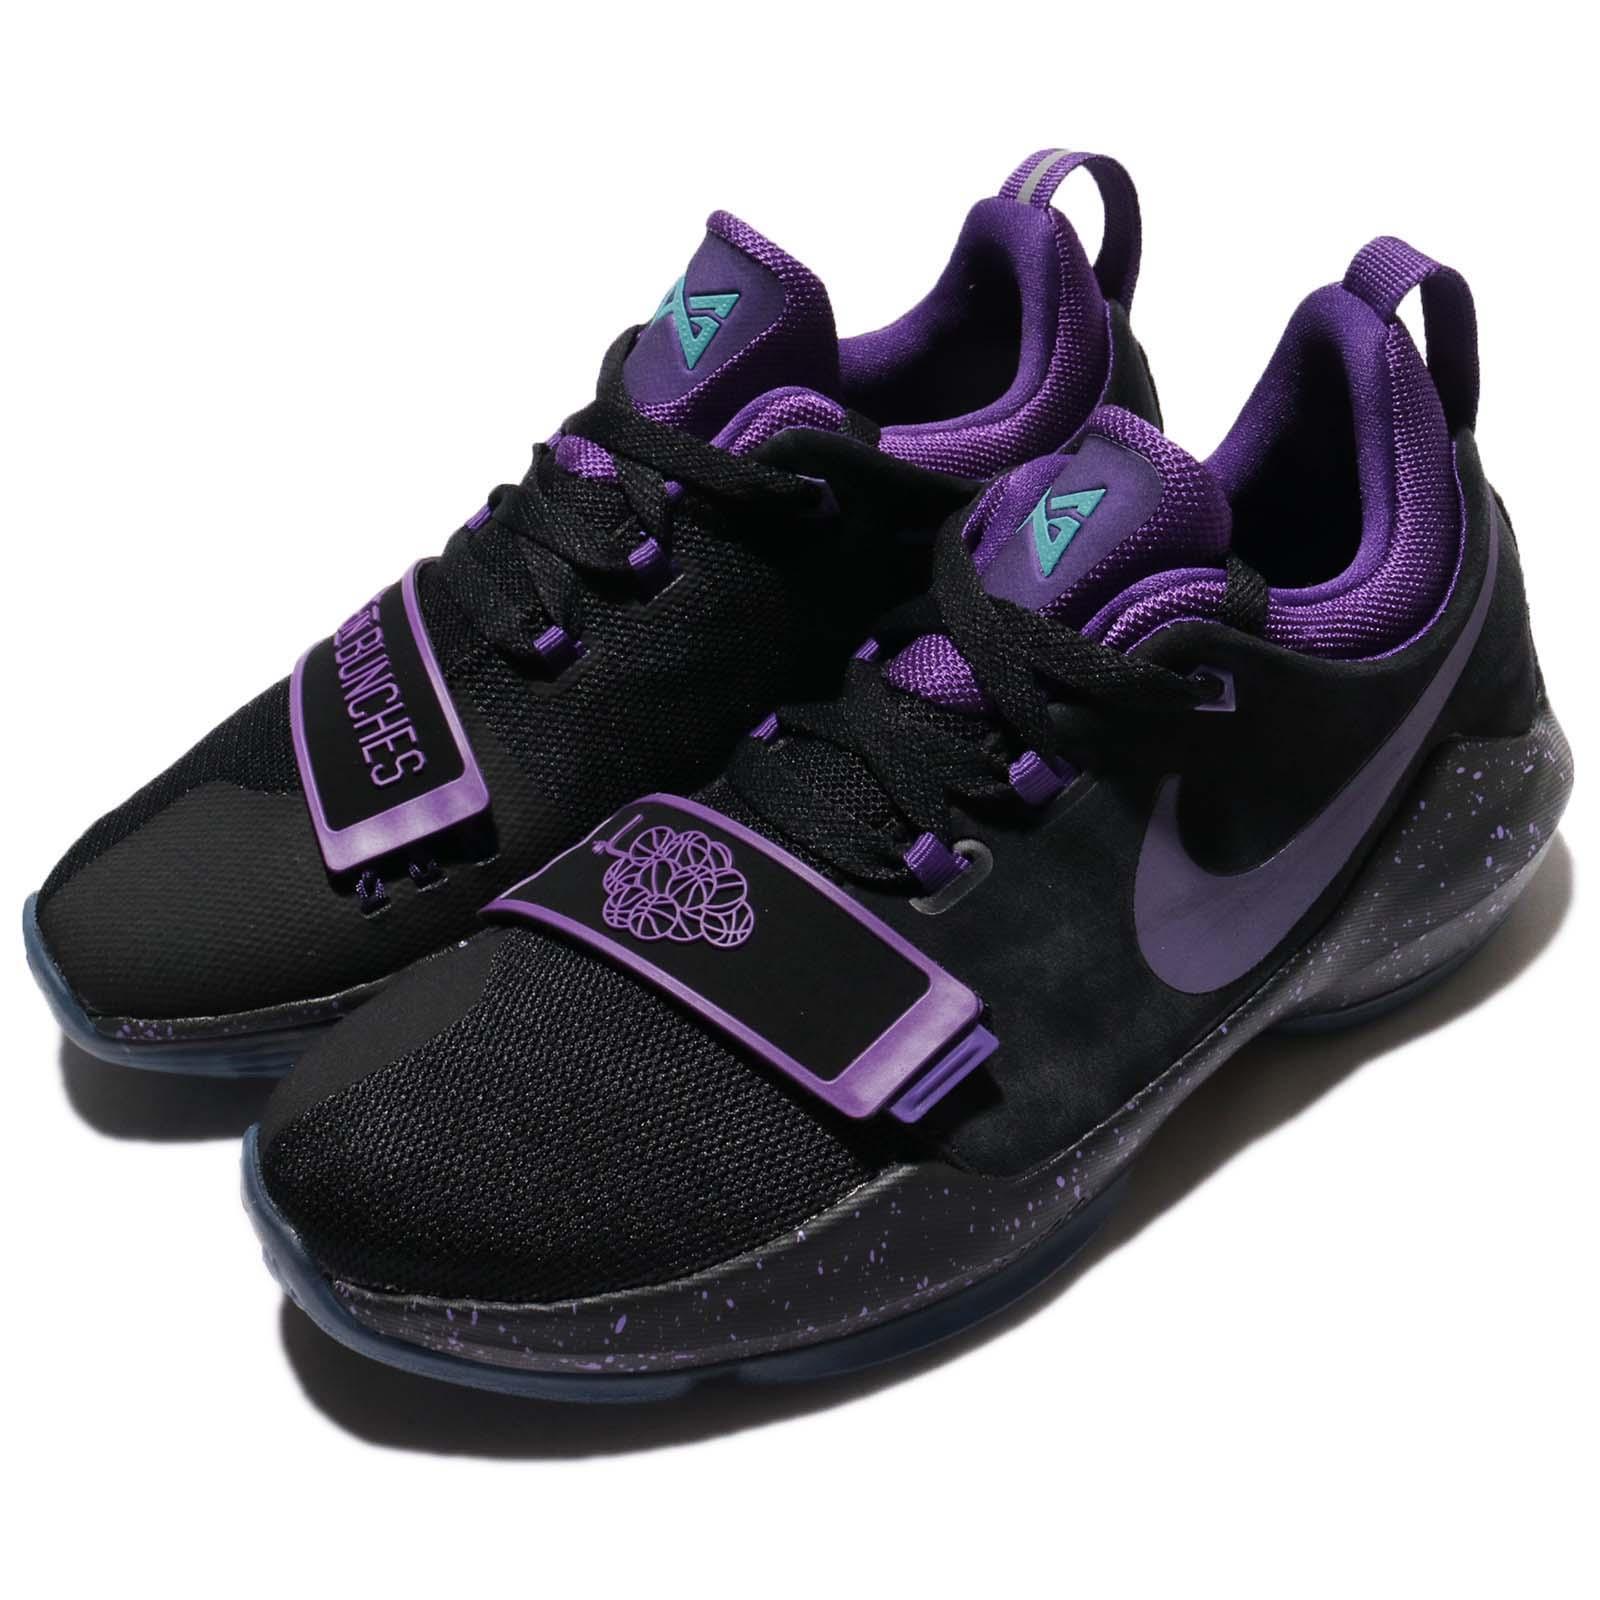 Nike 籃球鞋 PG 1 GS 運動 氣墊 女鞋 880304-097